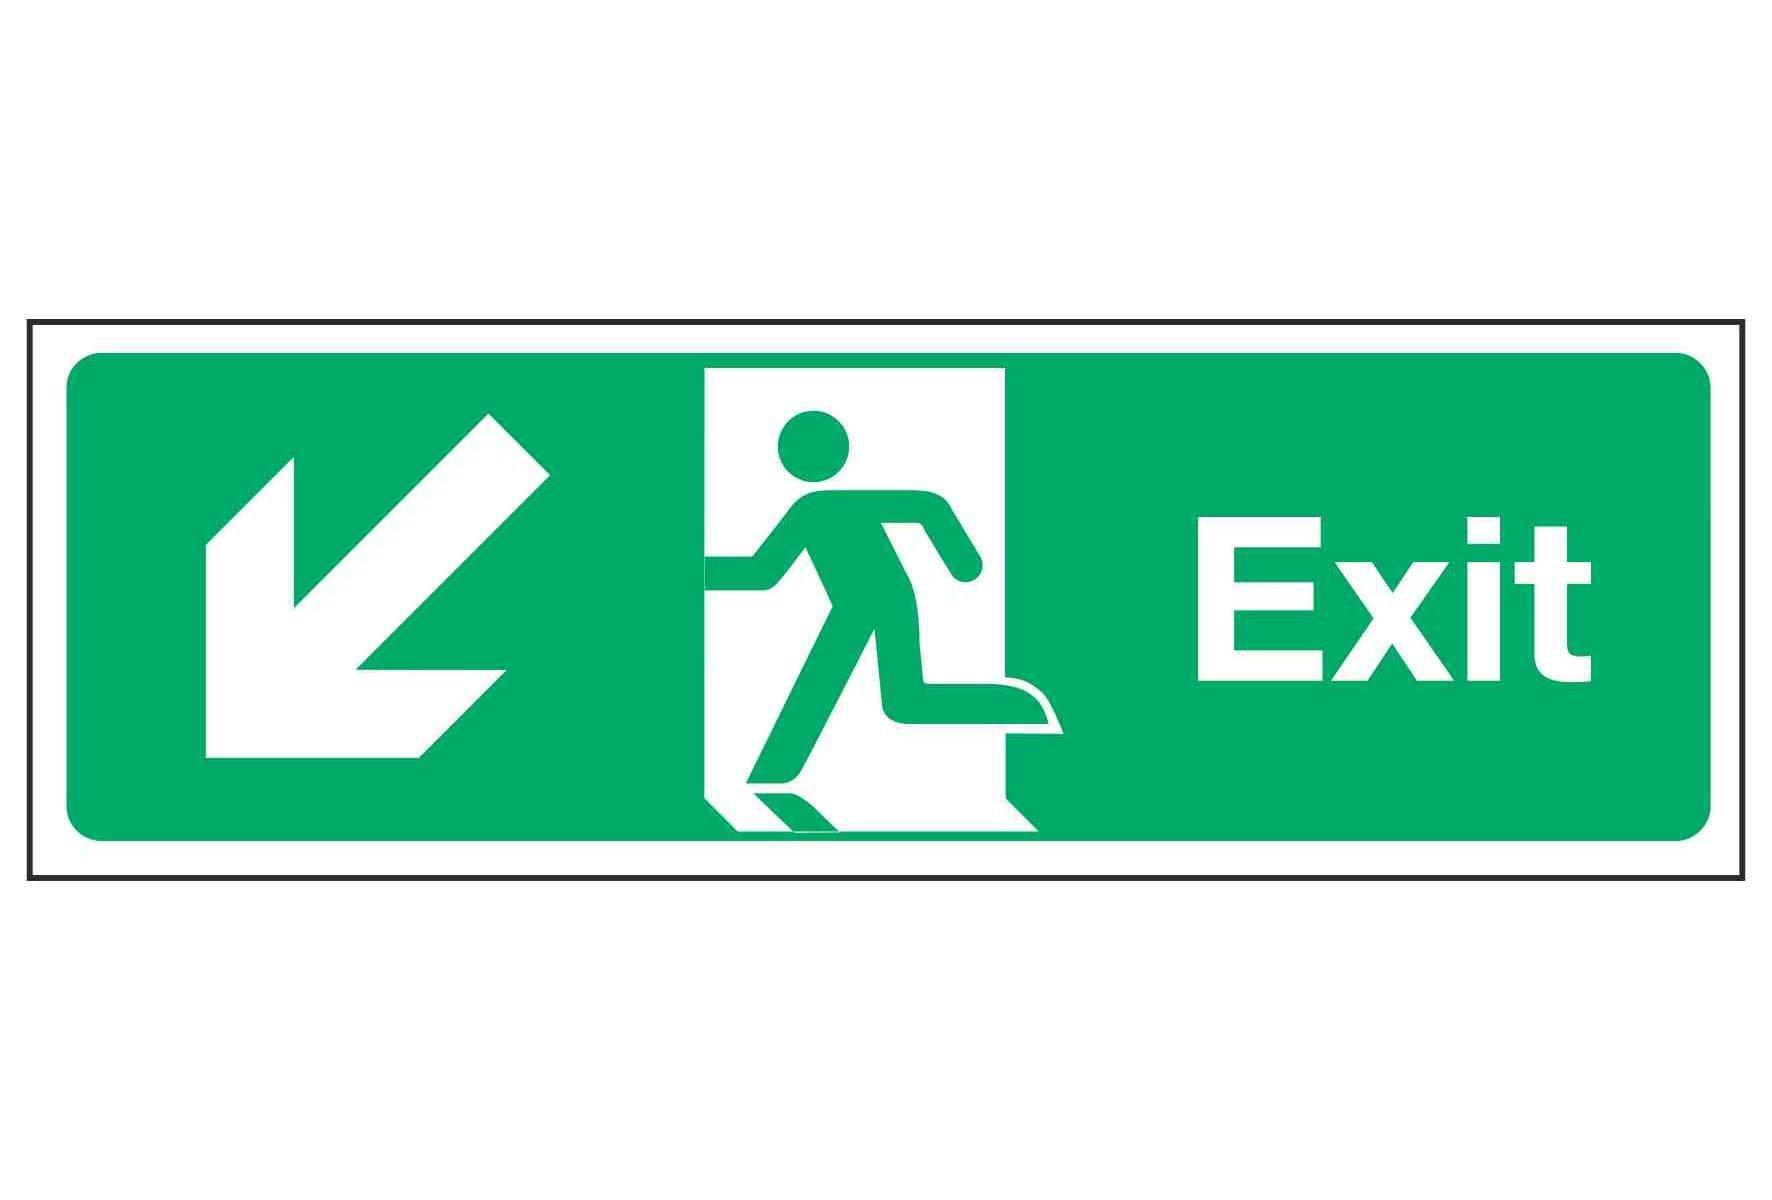 Exit / Arrow Down Left